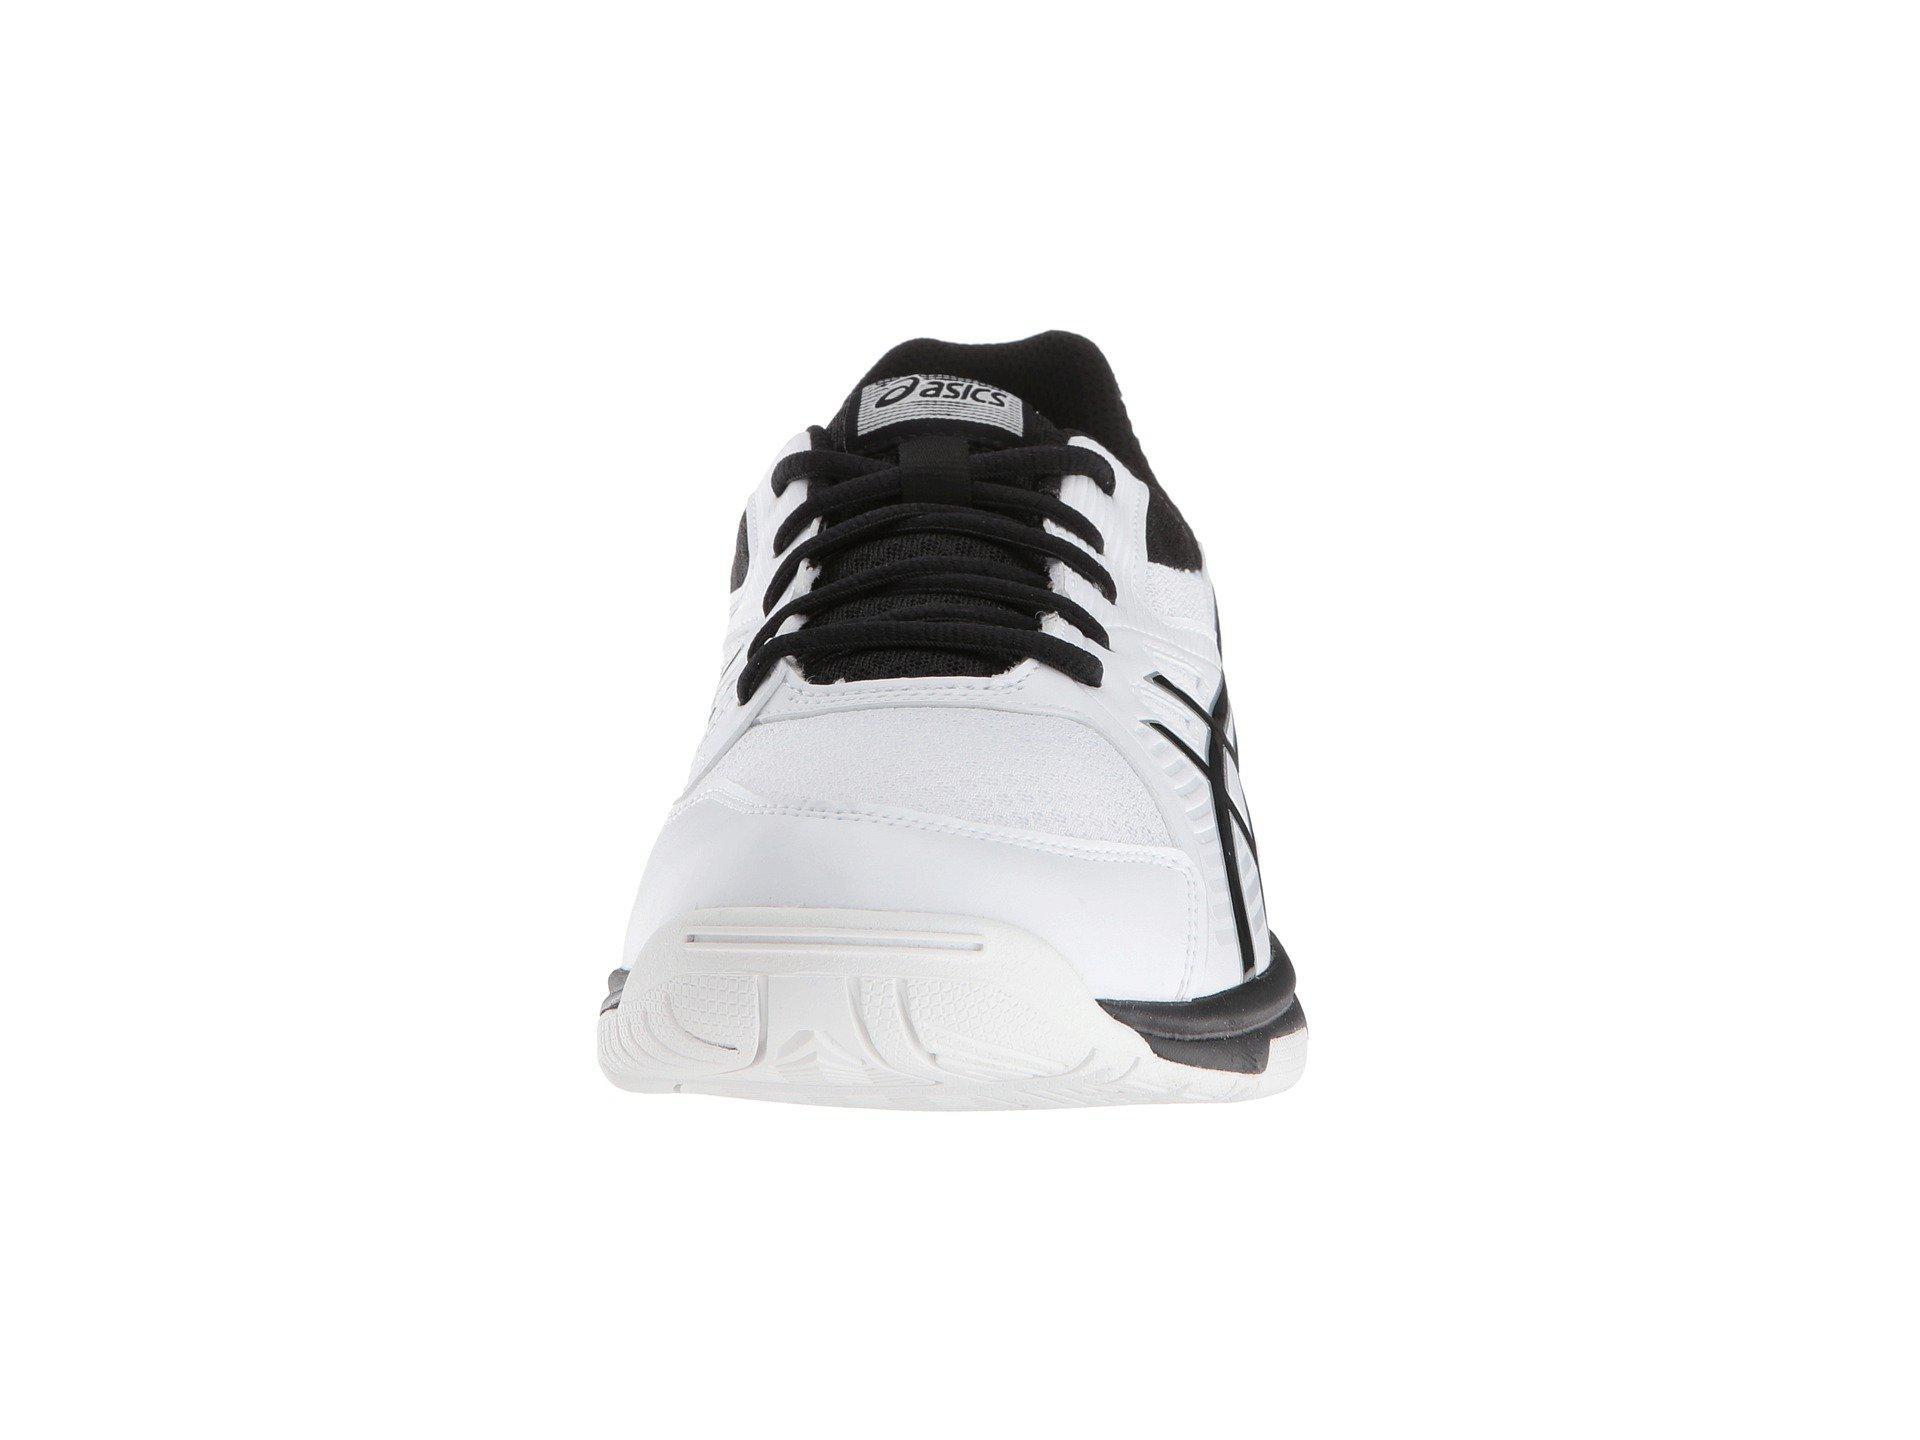 fd9e6550c0995c Volleyball 3 Men s whiteblack Lyst Upcourt Shoes Asics In Gel fq6YR7